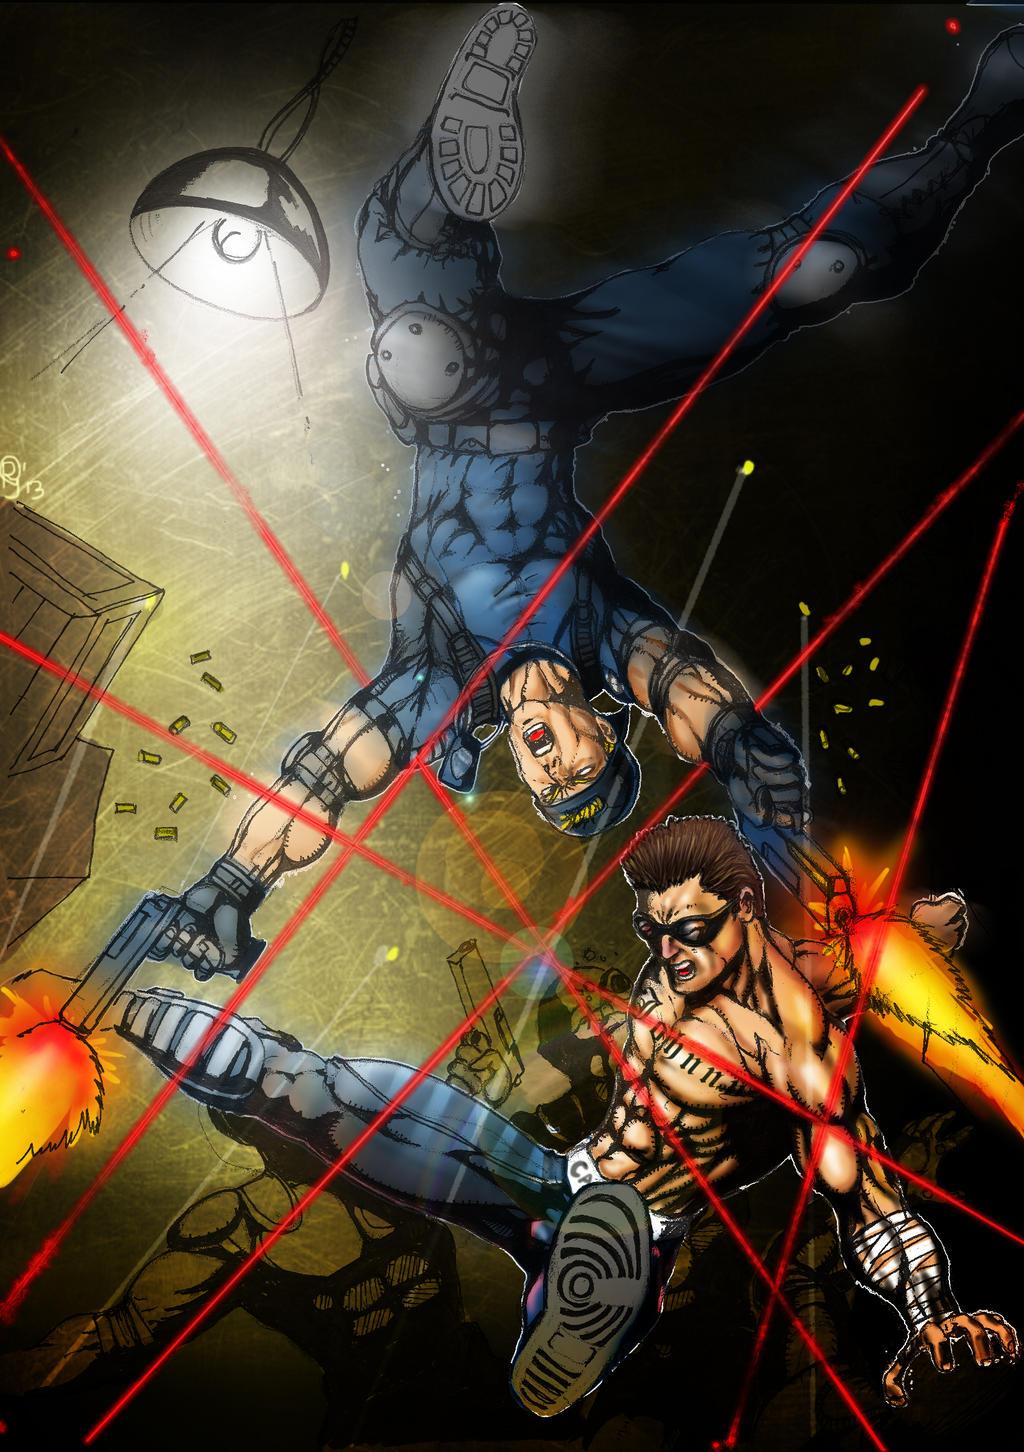 Stryker-Cage...Hardboiled by Grapiqkad